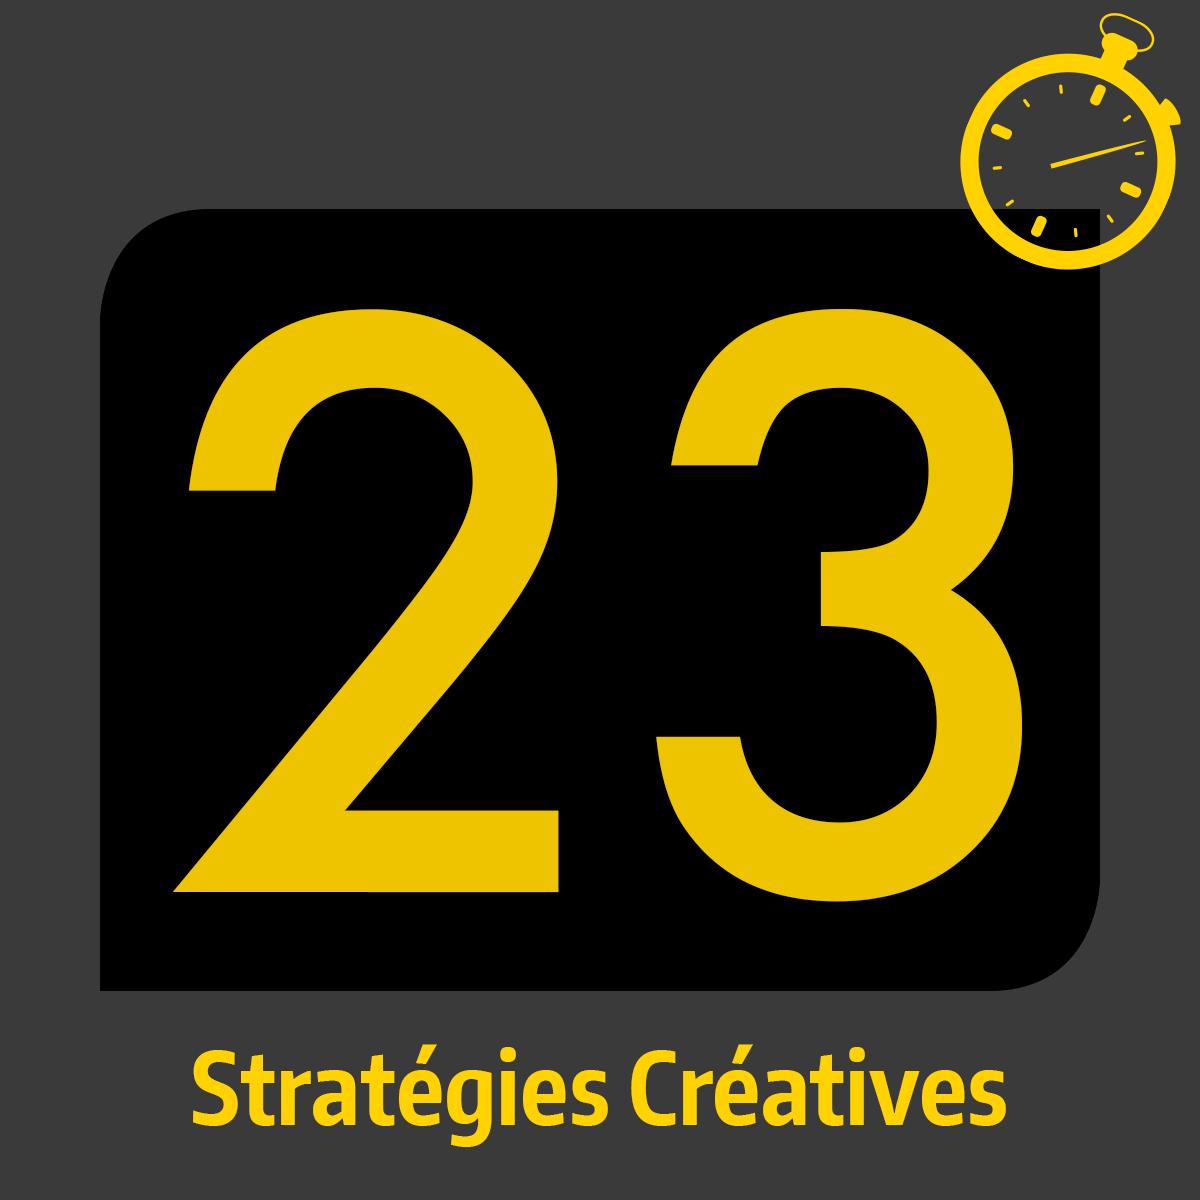 Formation accélérée - 23 Stratégies Créatives - Masterclass avec Crystal Distortion